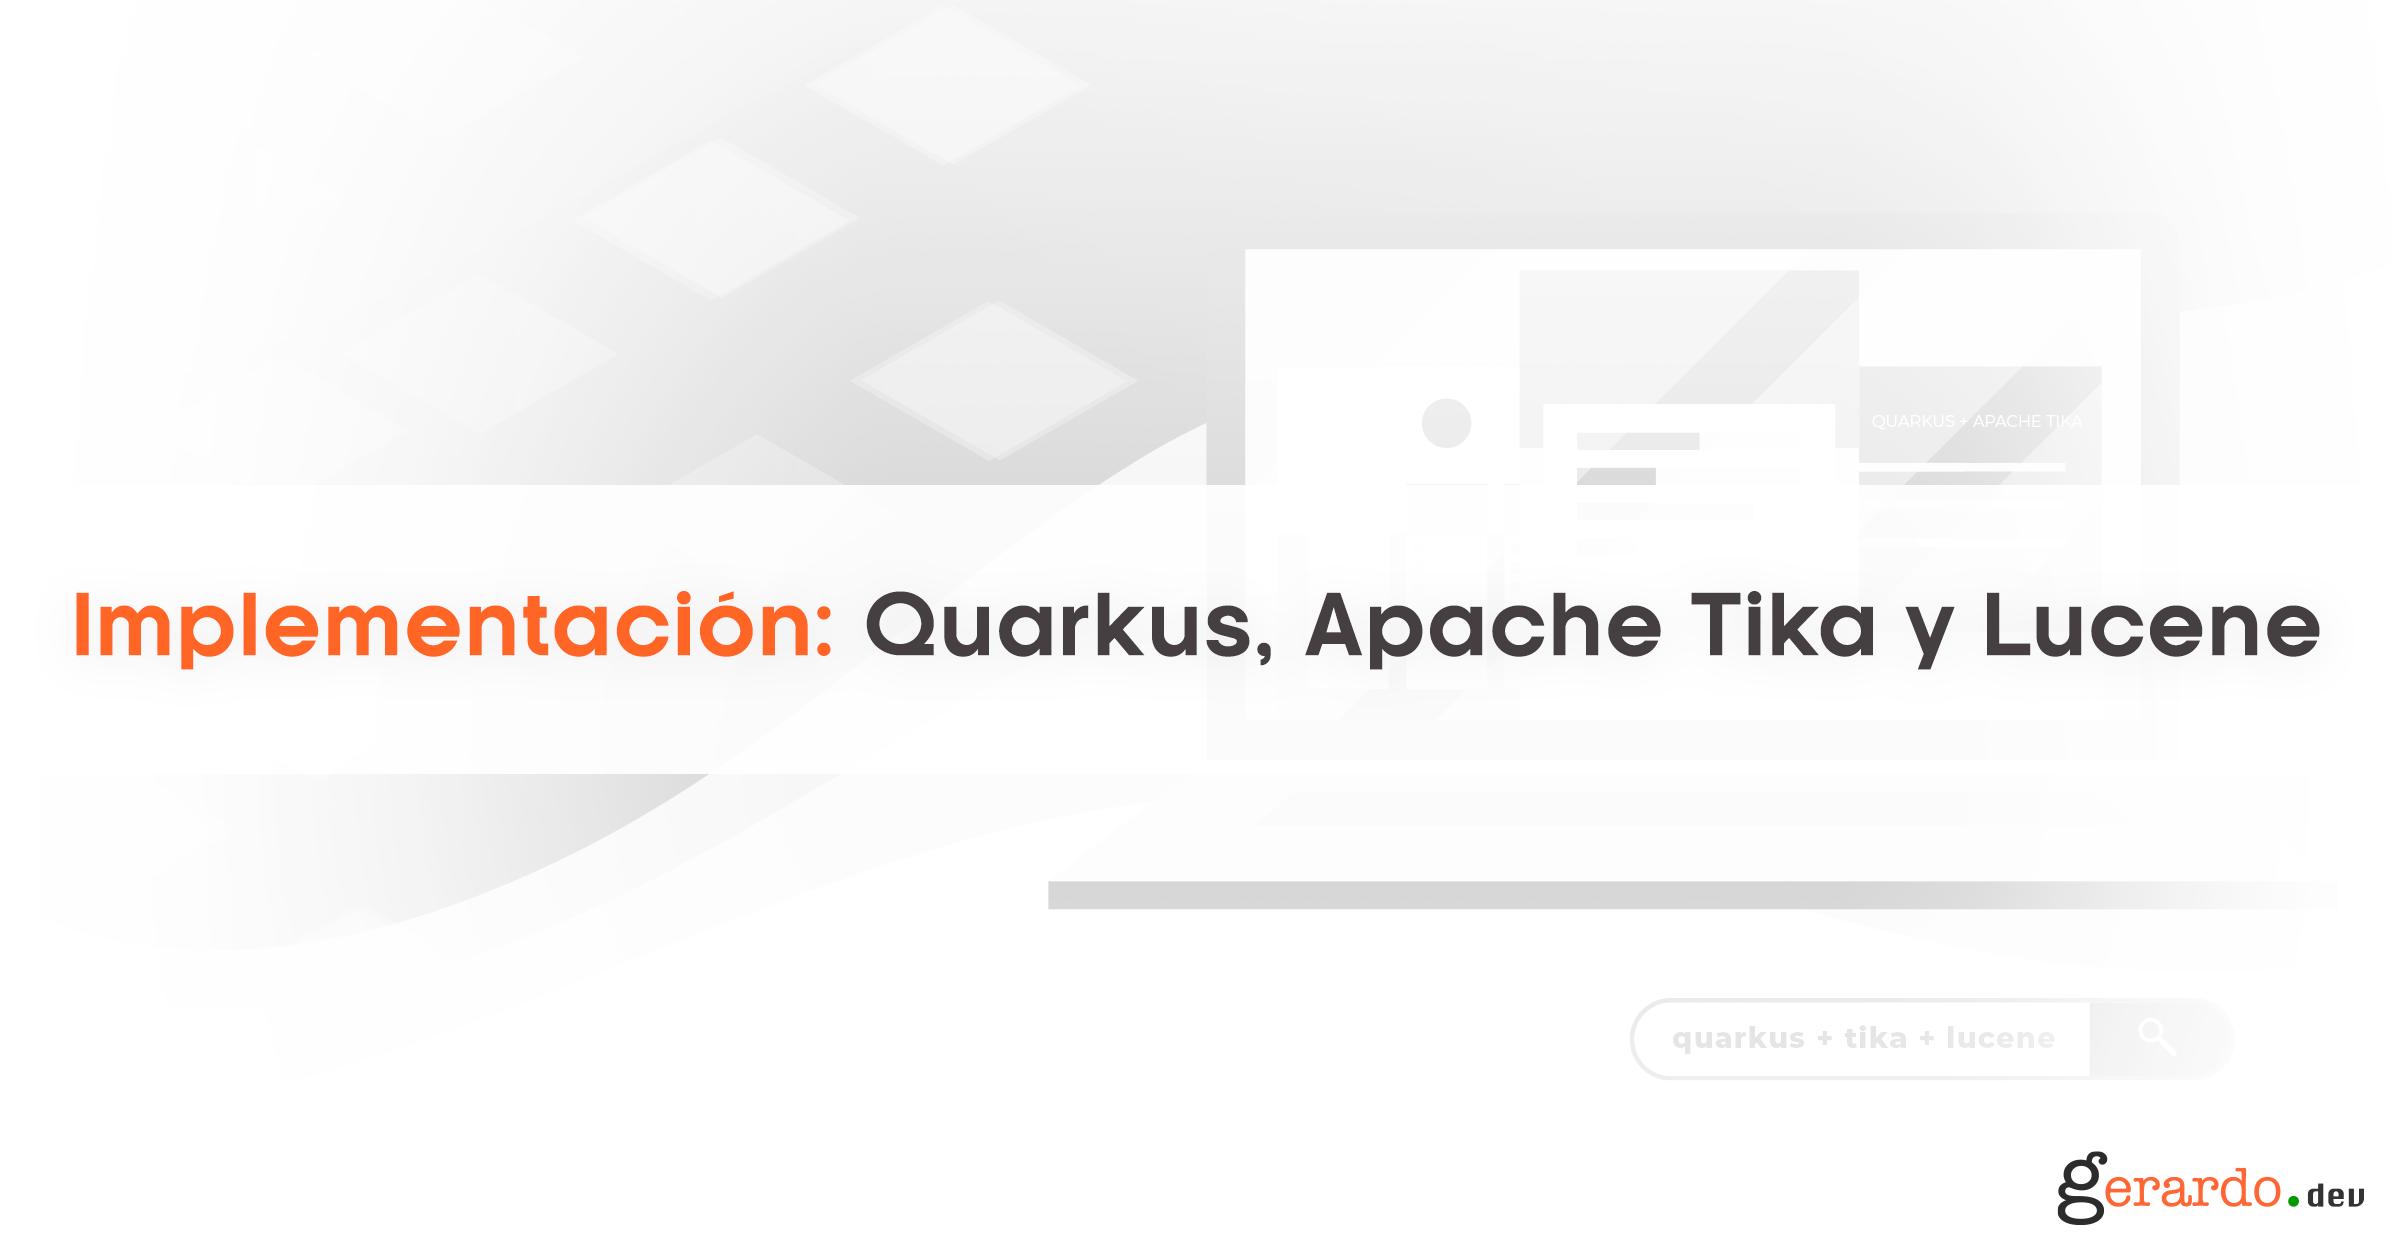 Quarkus, Apache Tika y Lucene